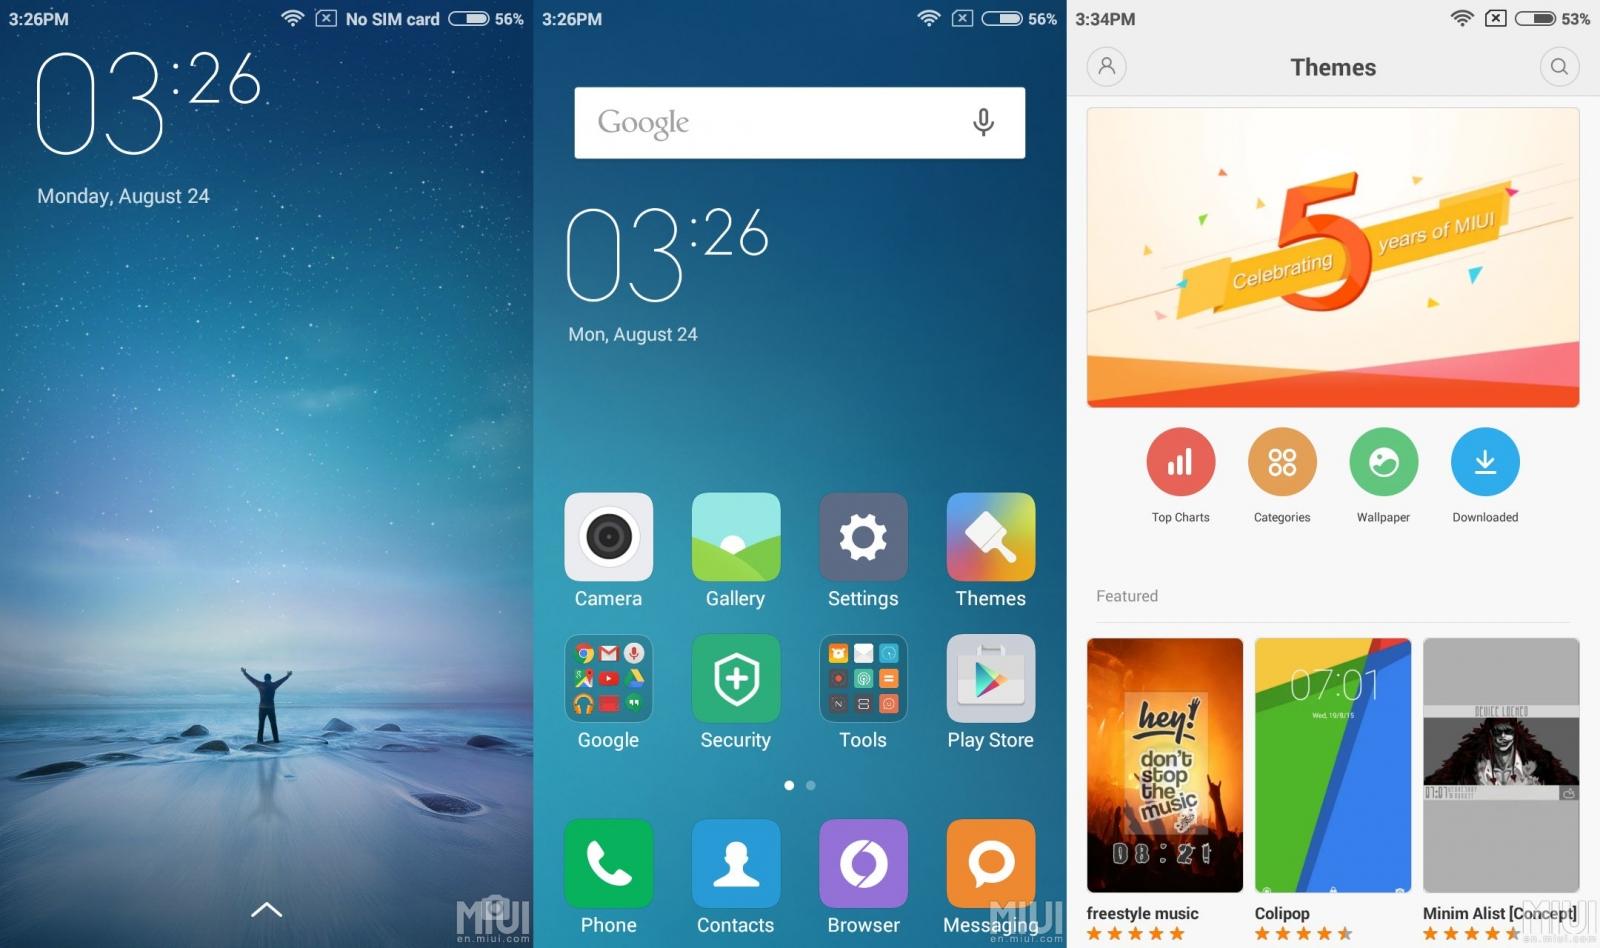 Xiaomi Releases MIUI 7 Global Beta ROM 5822 OTA For A